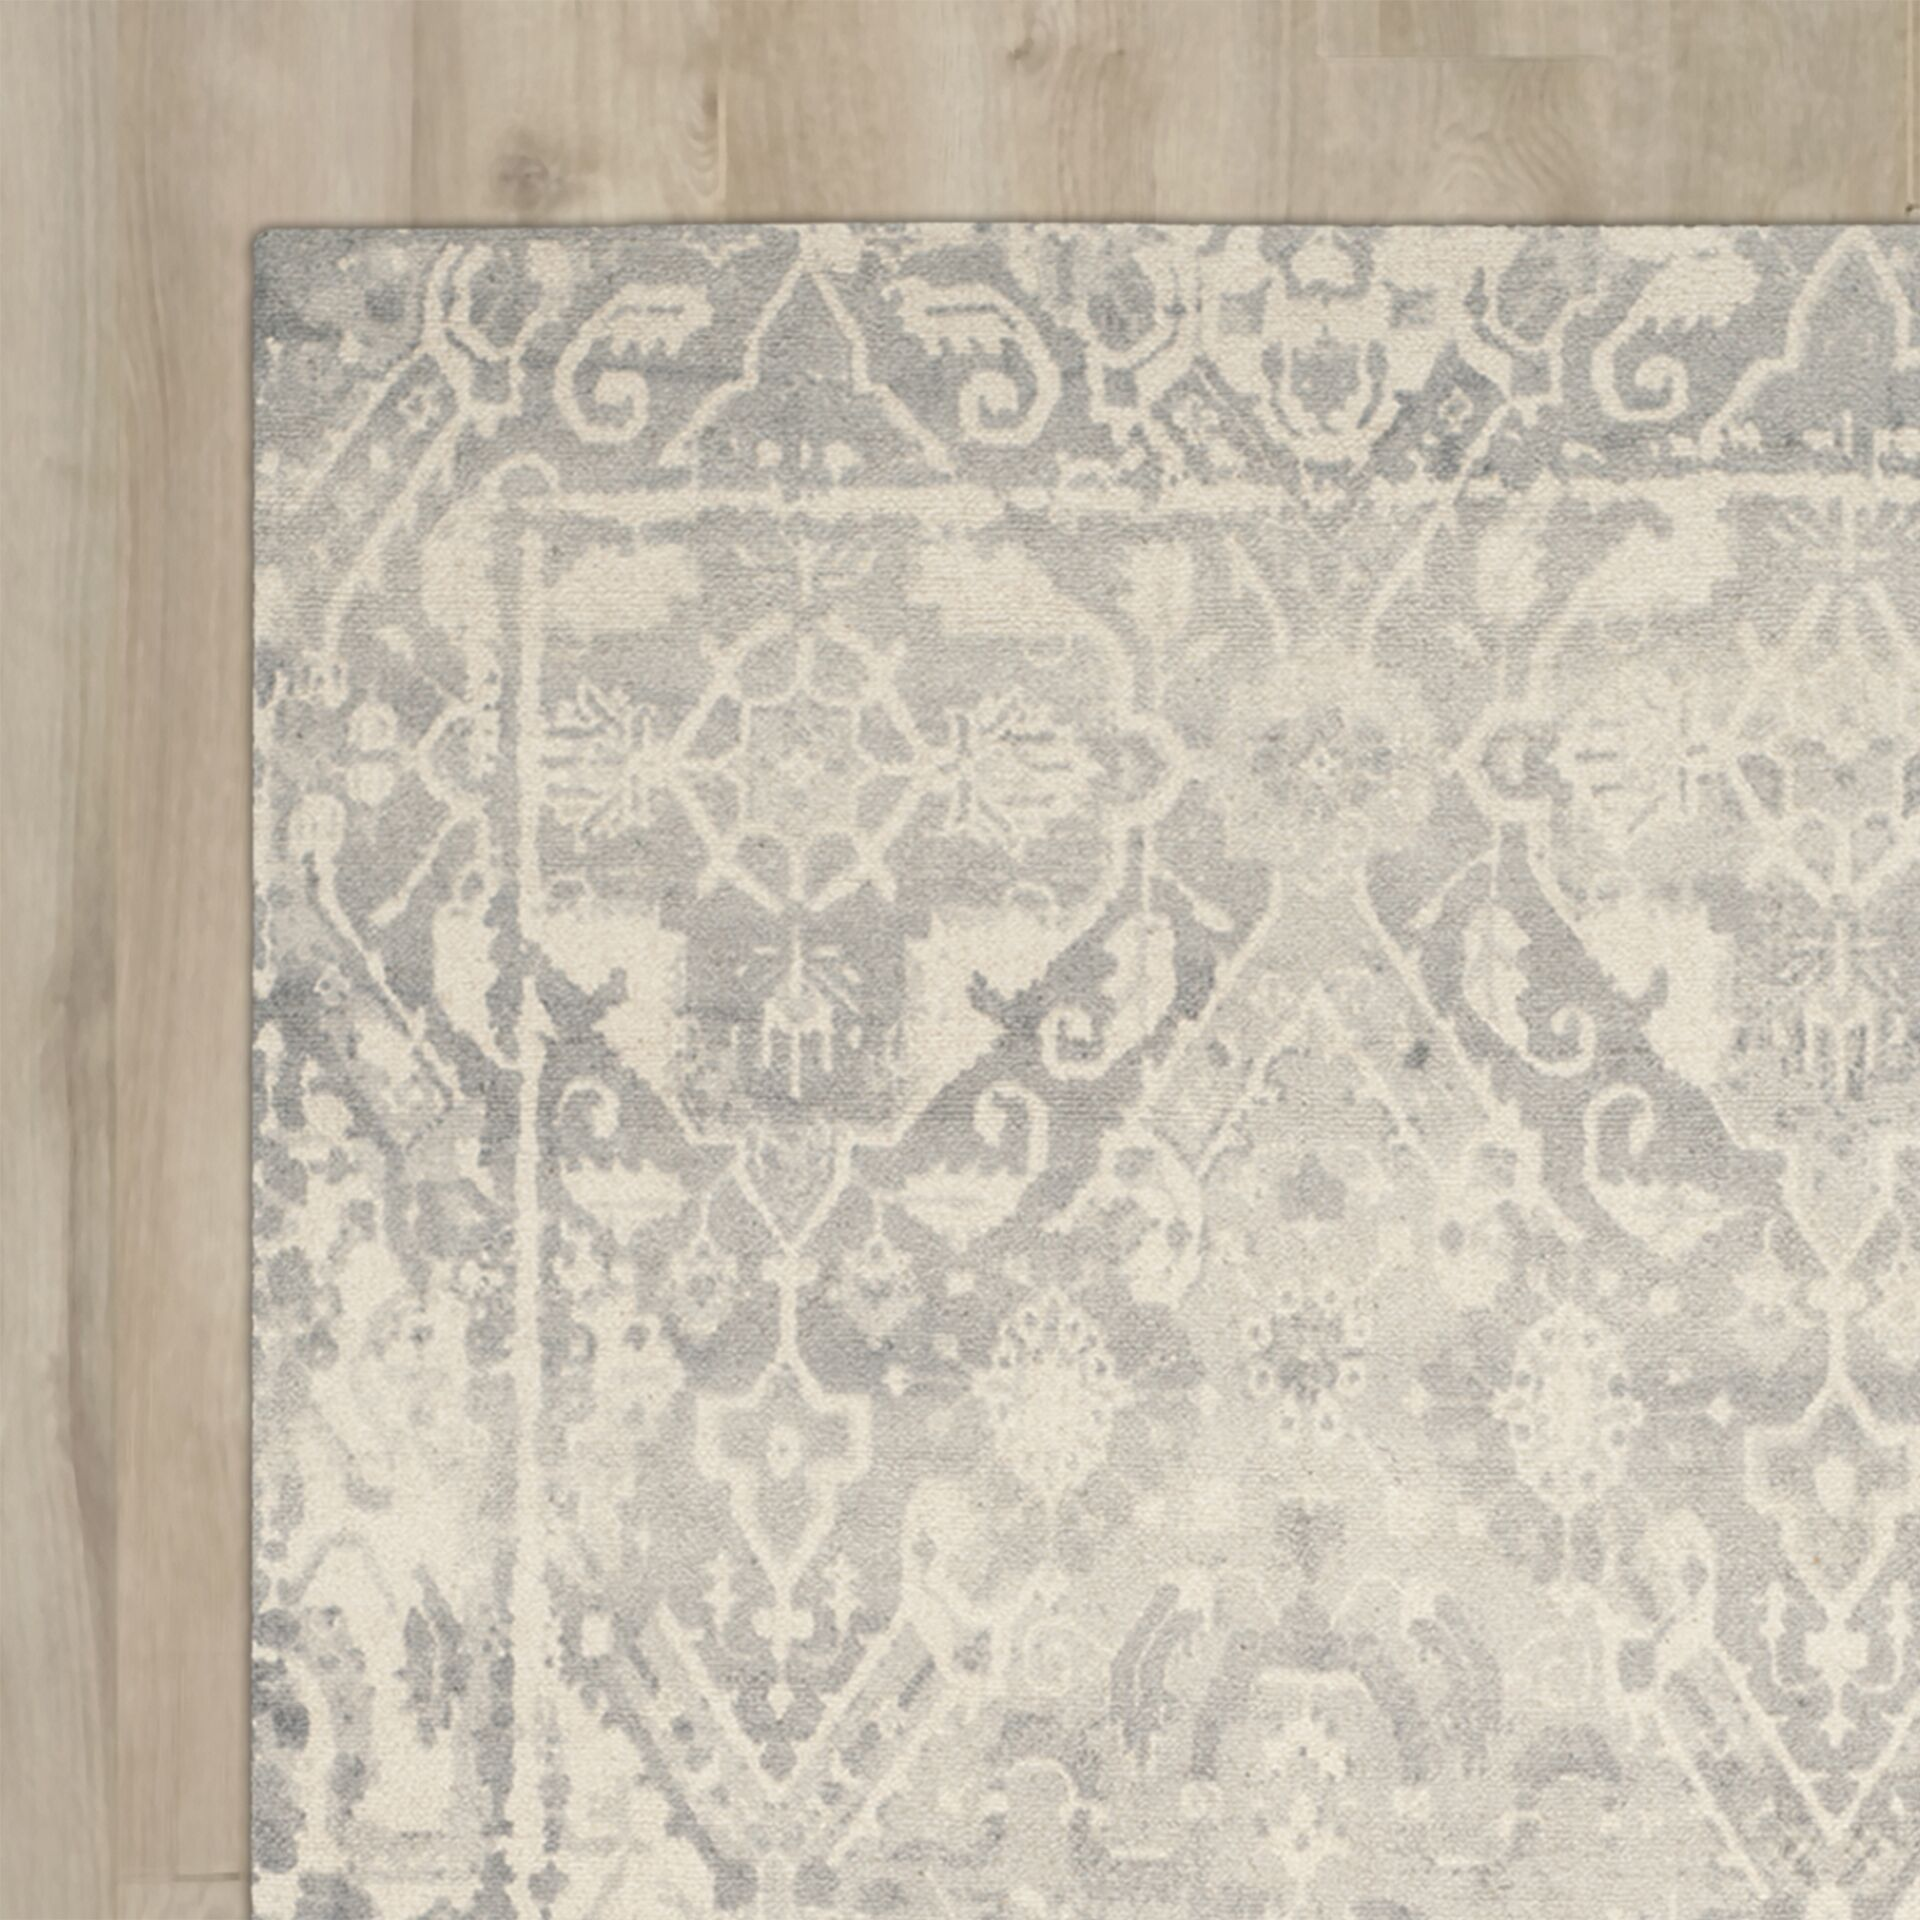 Katy Hand-Tufted Light Gray / Ivory Area Rug Rug Size: Rectangle 6' x 9'